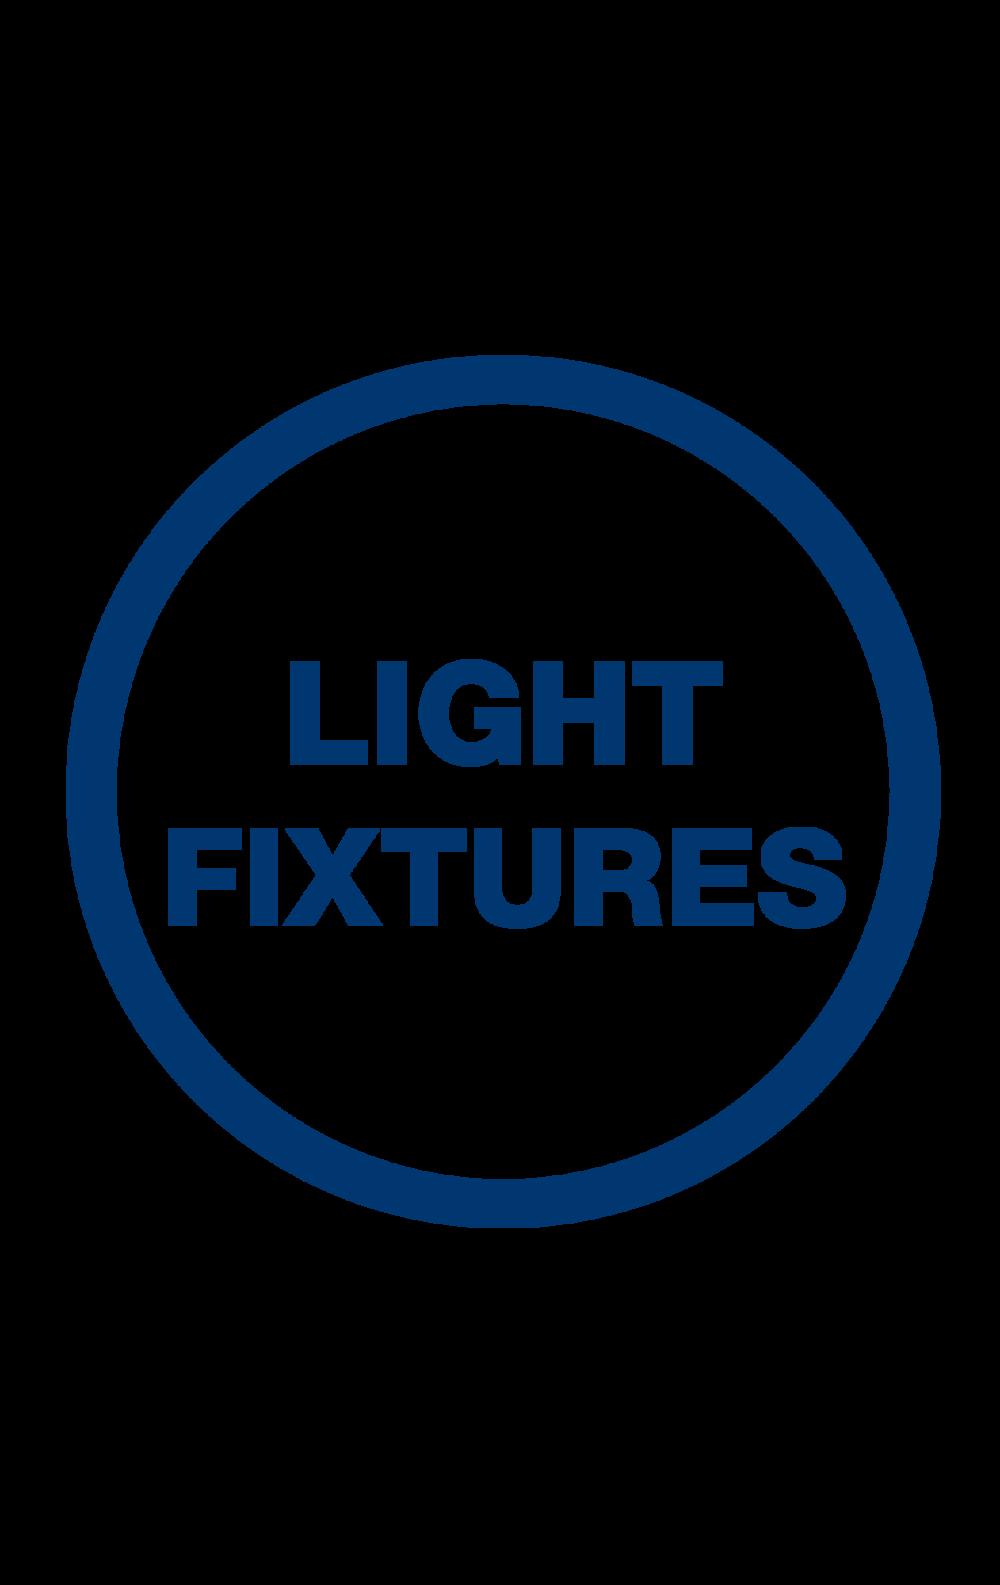 light-fixtures-2.png